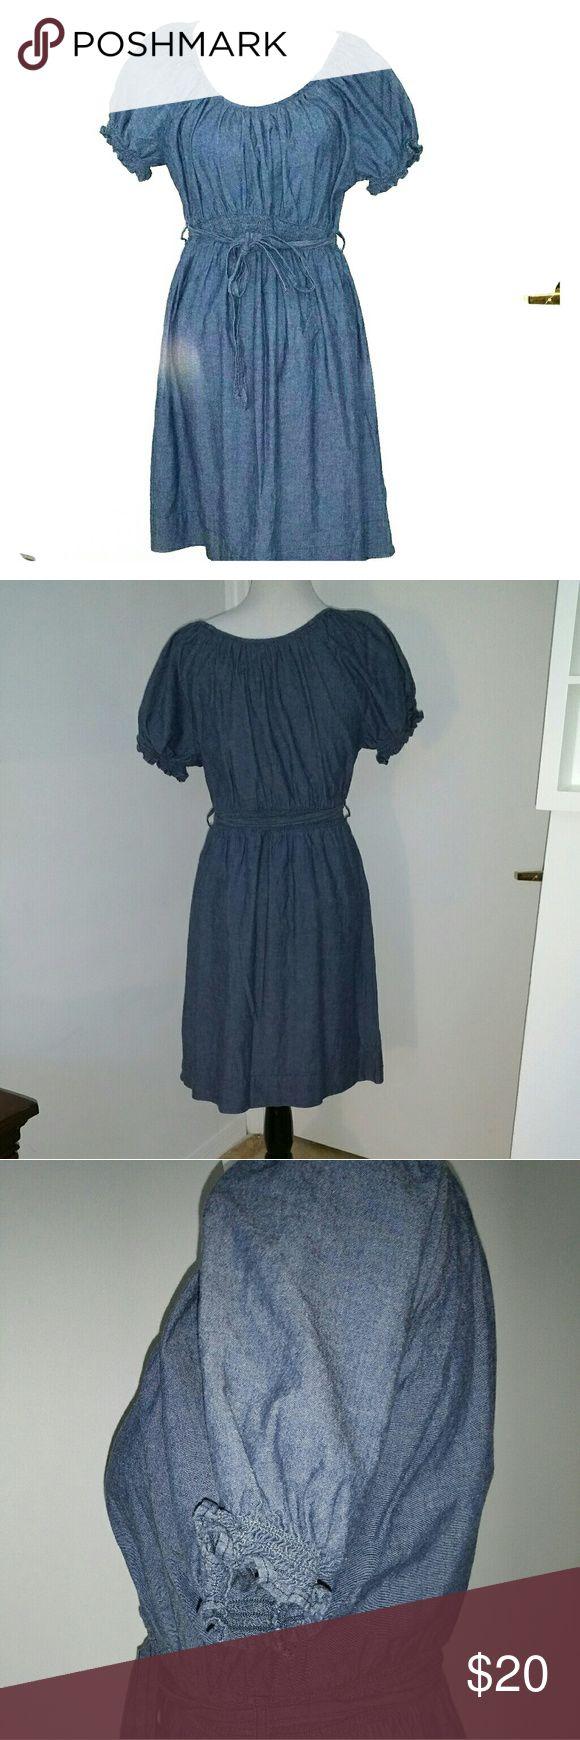 The 25 best denim maternity dresses ideas on pinterest summer denim maternity dress ombrellifo Choice Image